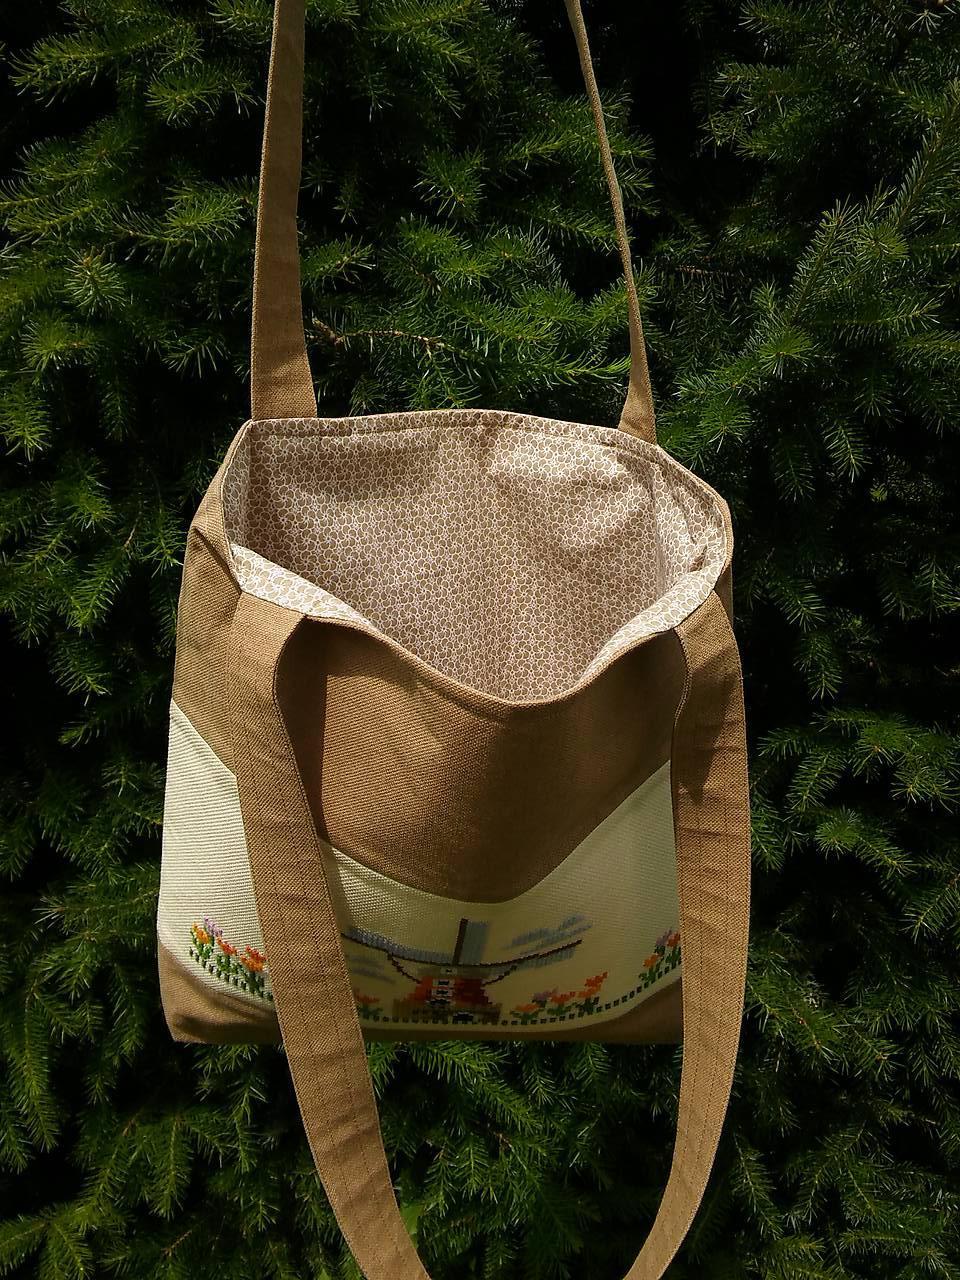 Plátenná taška Holandsko   TASKYODMARUSKY - SAShE.sk - Handmade Kabelky 61dafaaa9c7